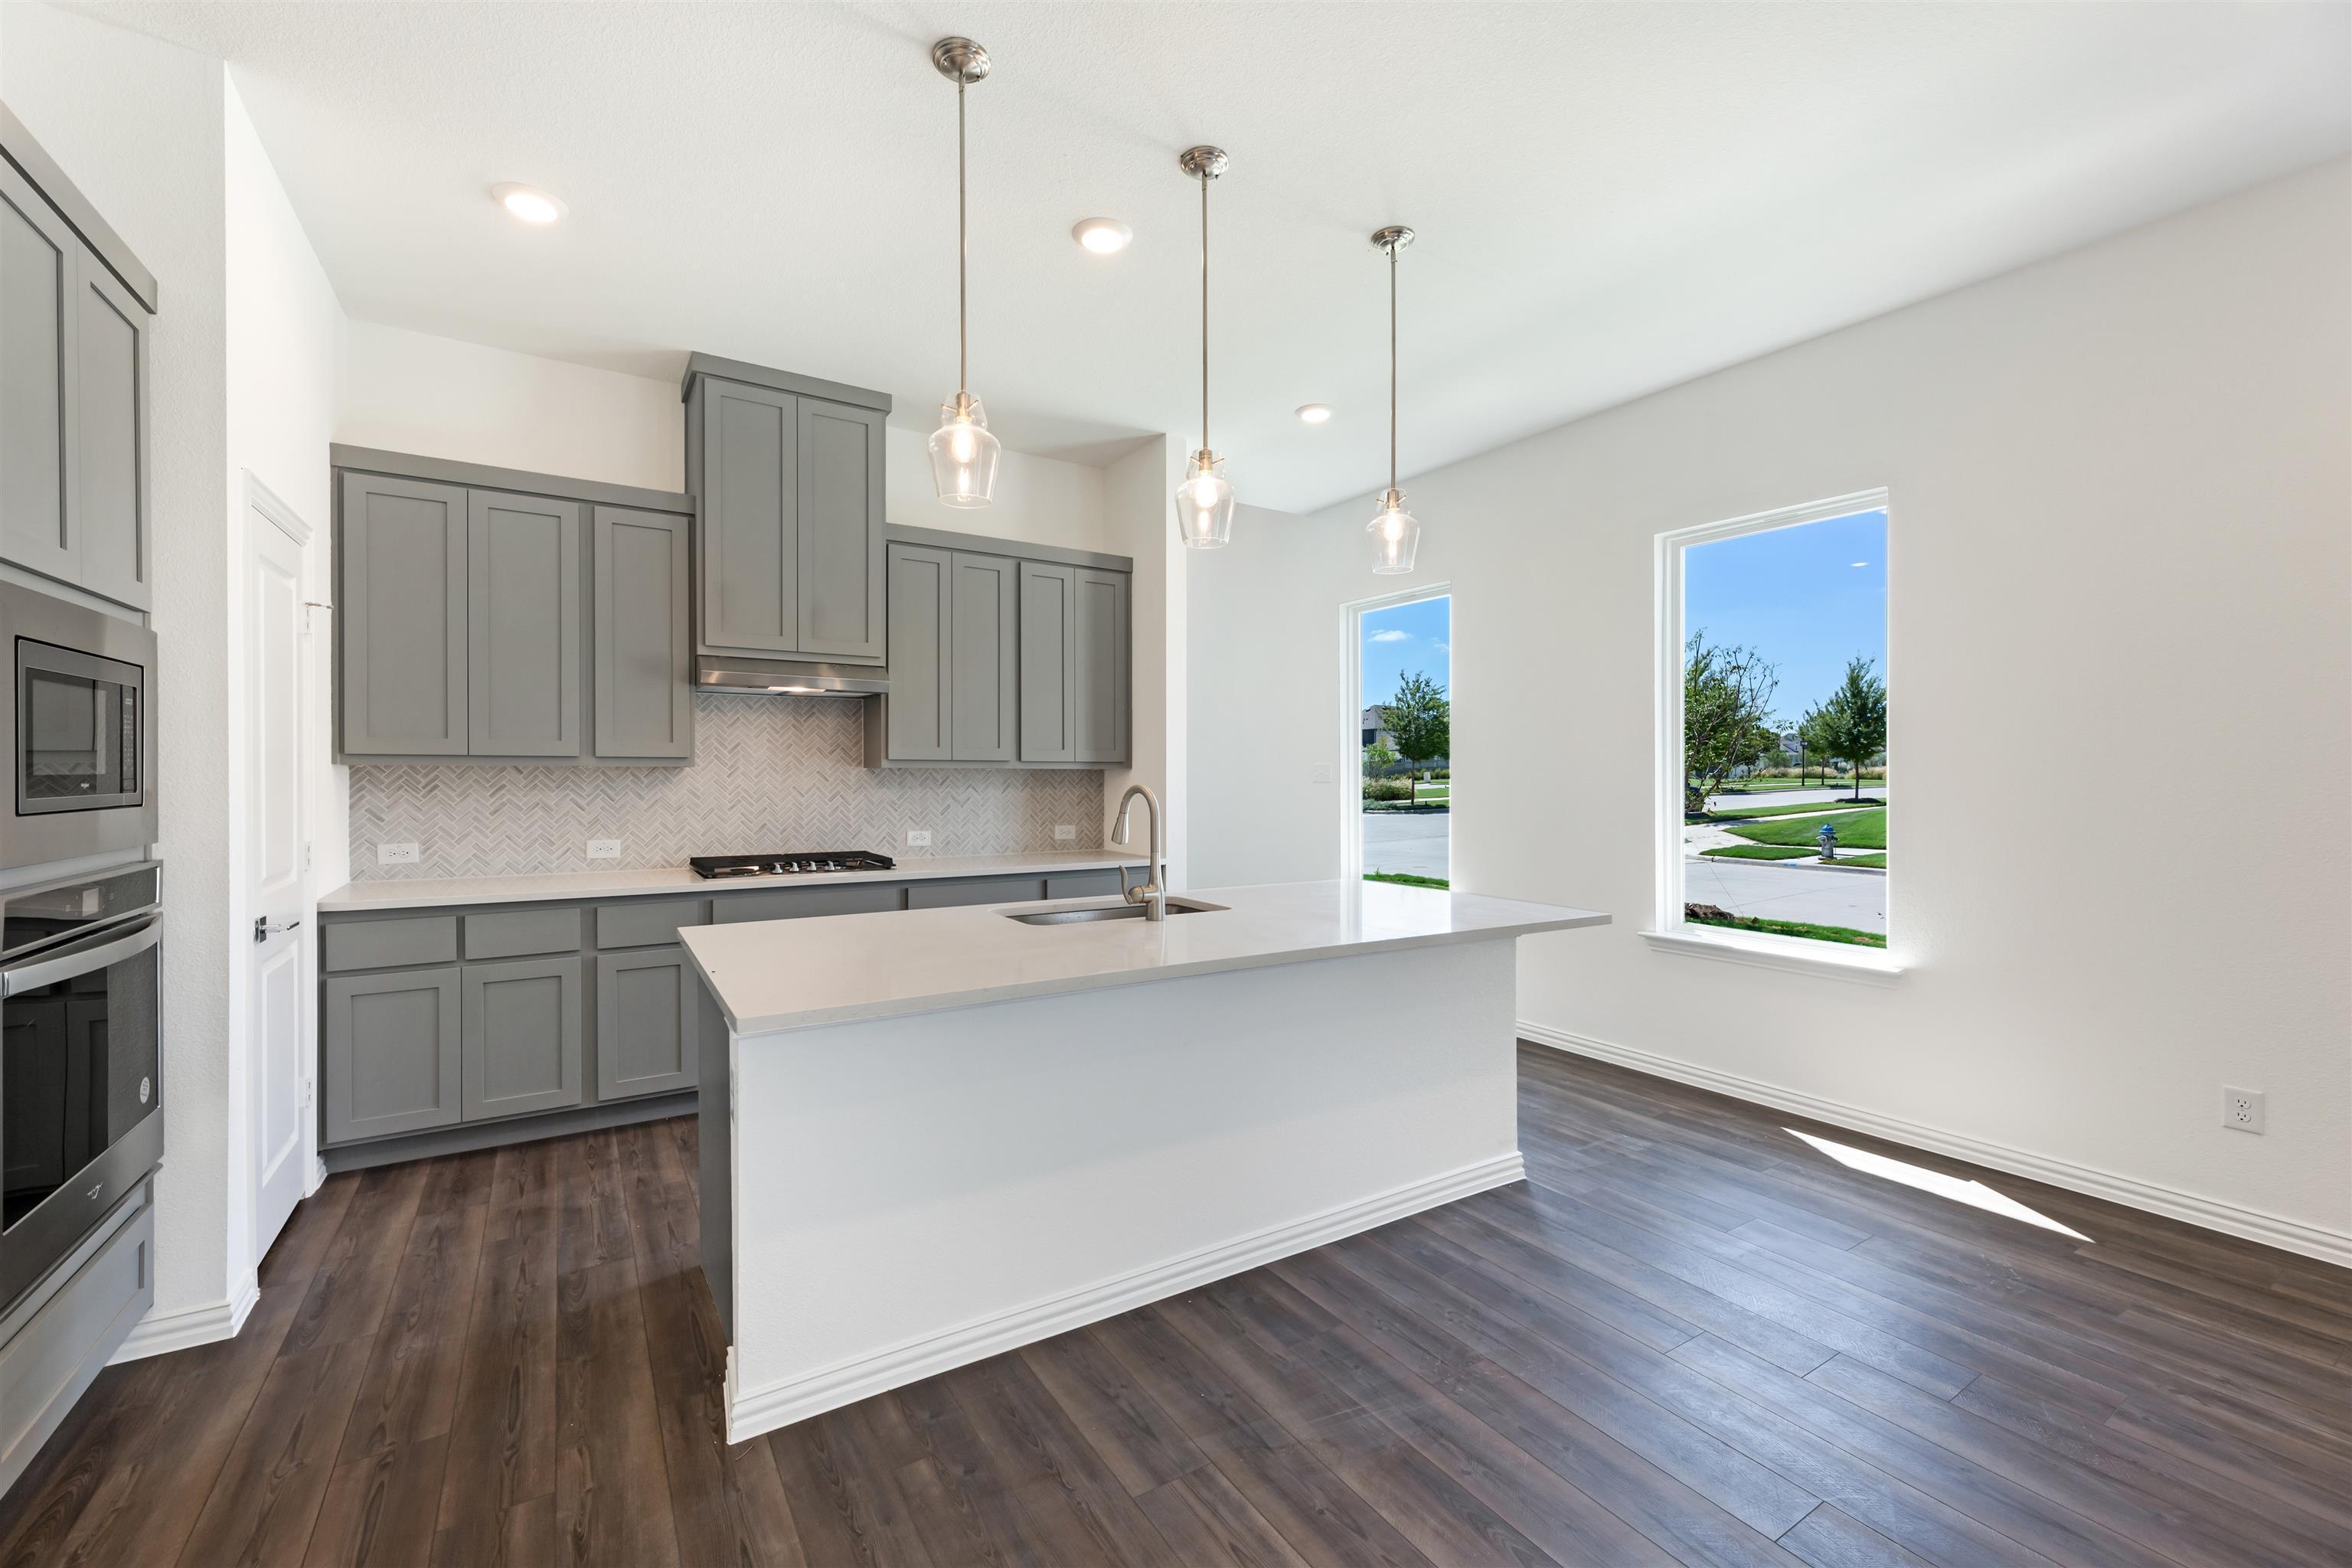 Kitchen featured in the Aubrey By Ashton Woods in Dallas, TX